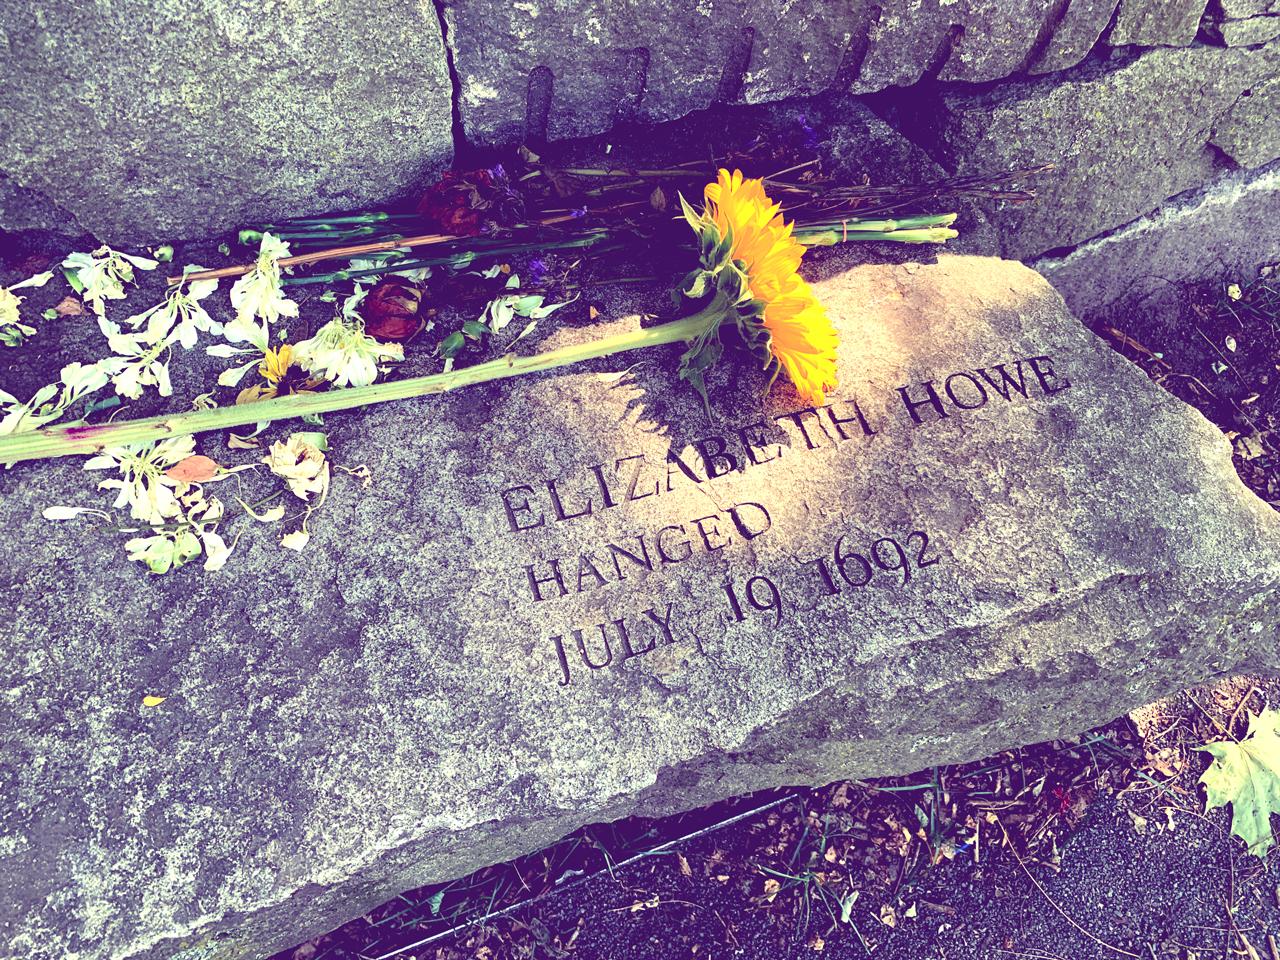 salem-witch-trials-memorial-massachusetts-elizabeth-howe-1280x960